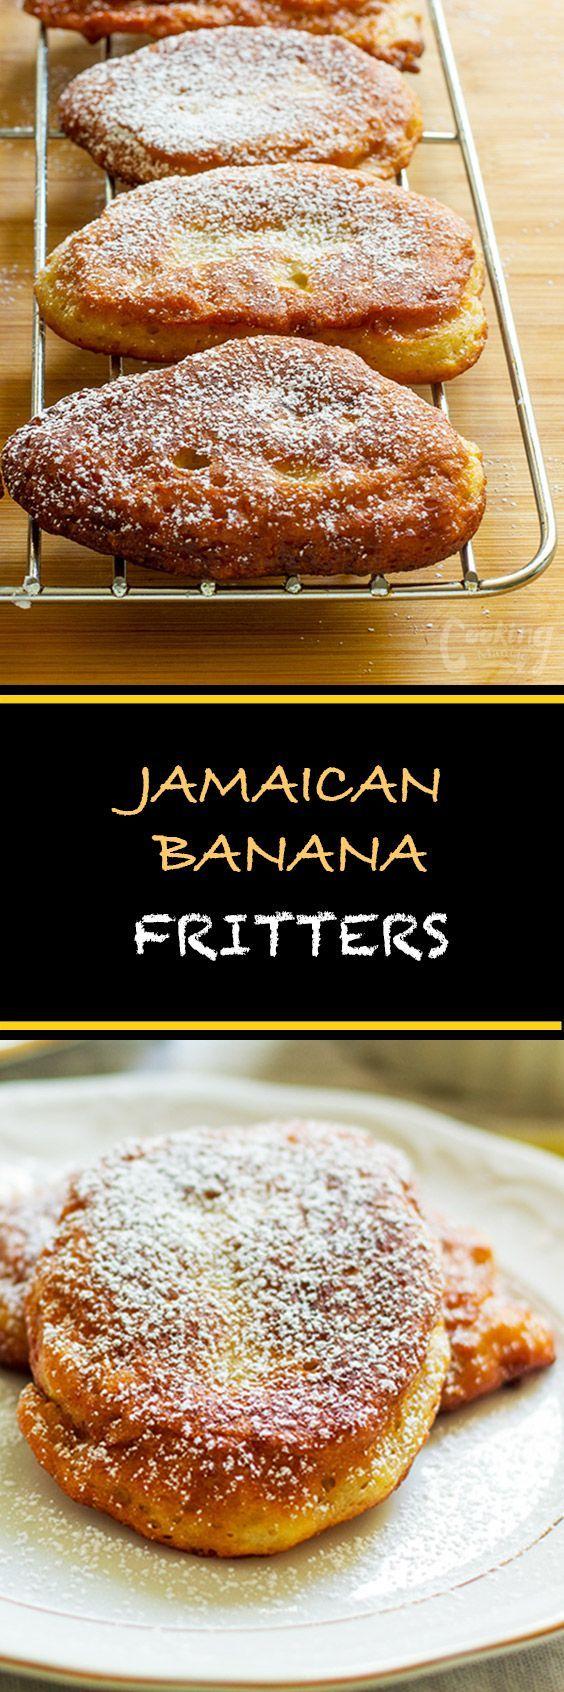 Best 25 Bahamian Food Ideas On Pinterest Bahamian Bread